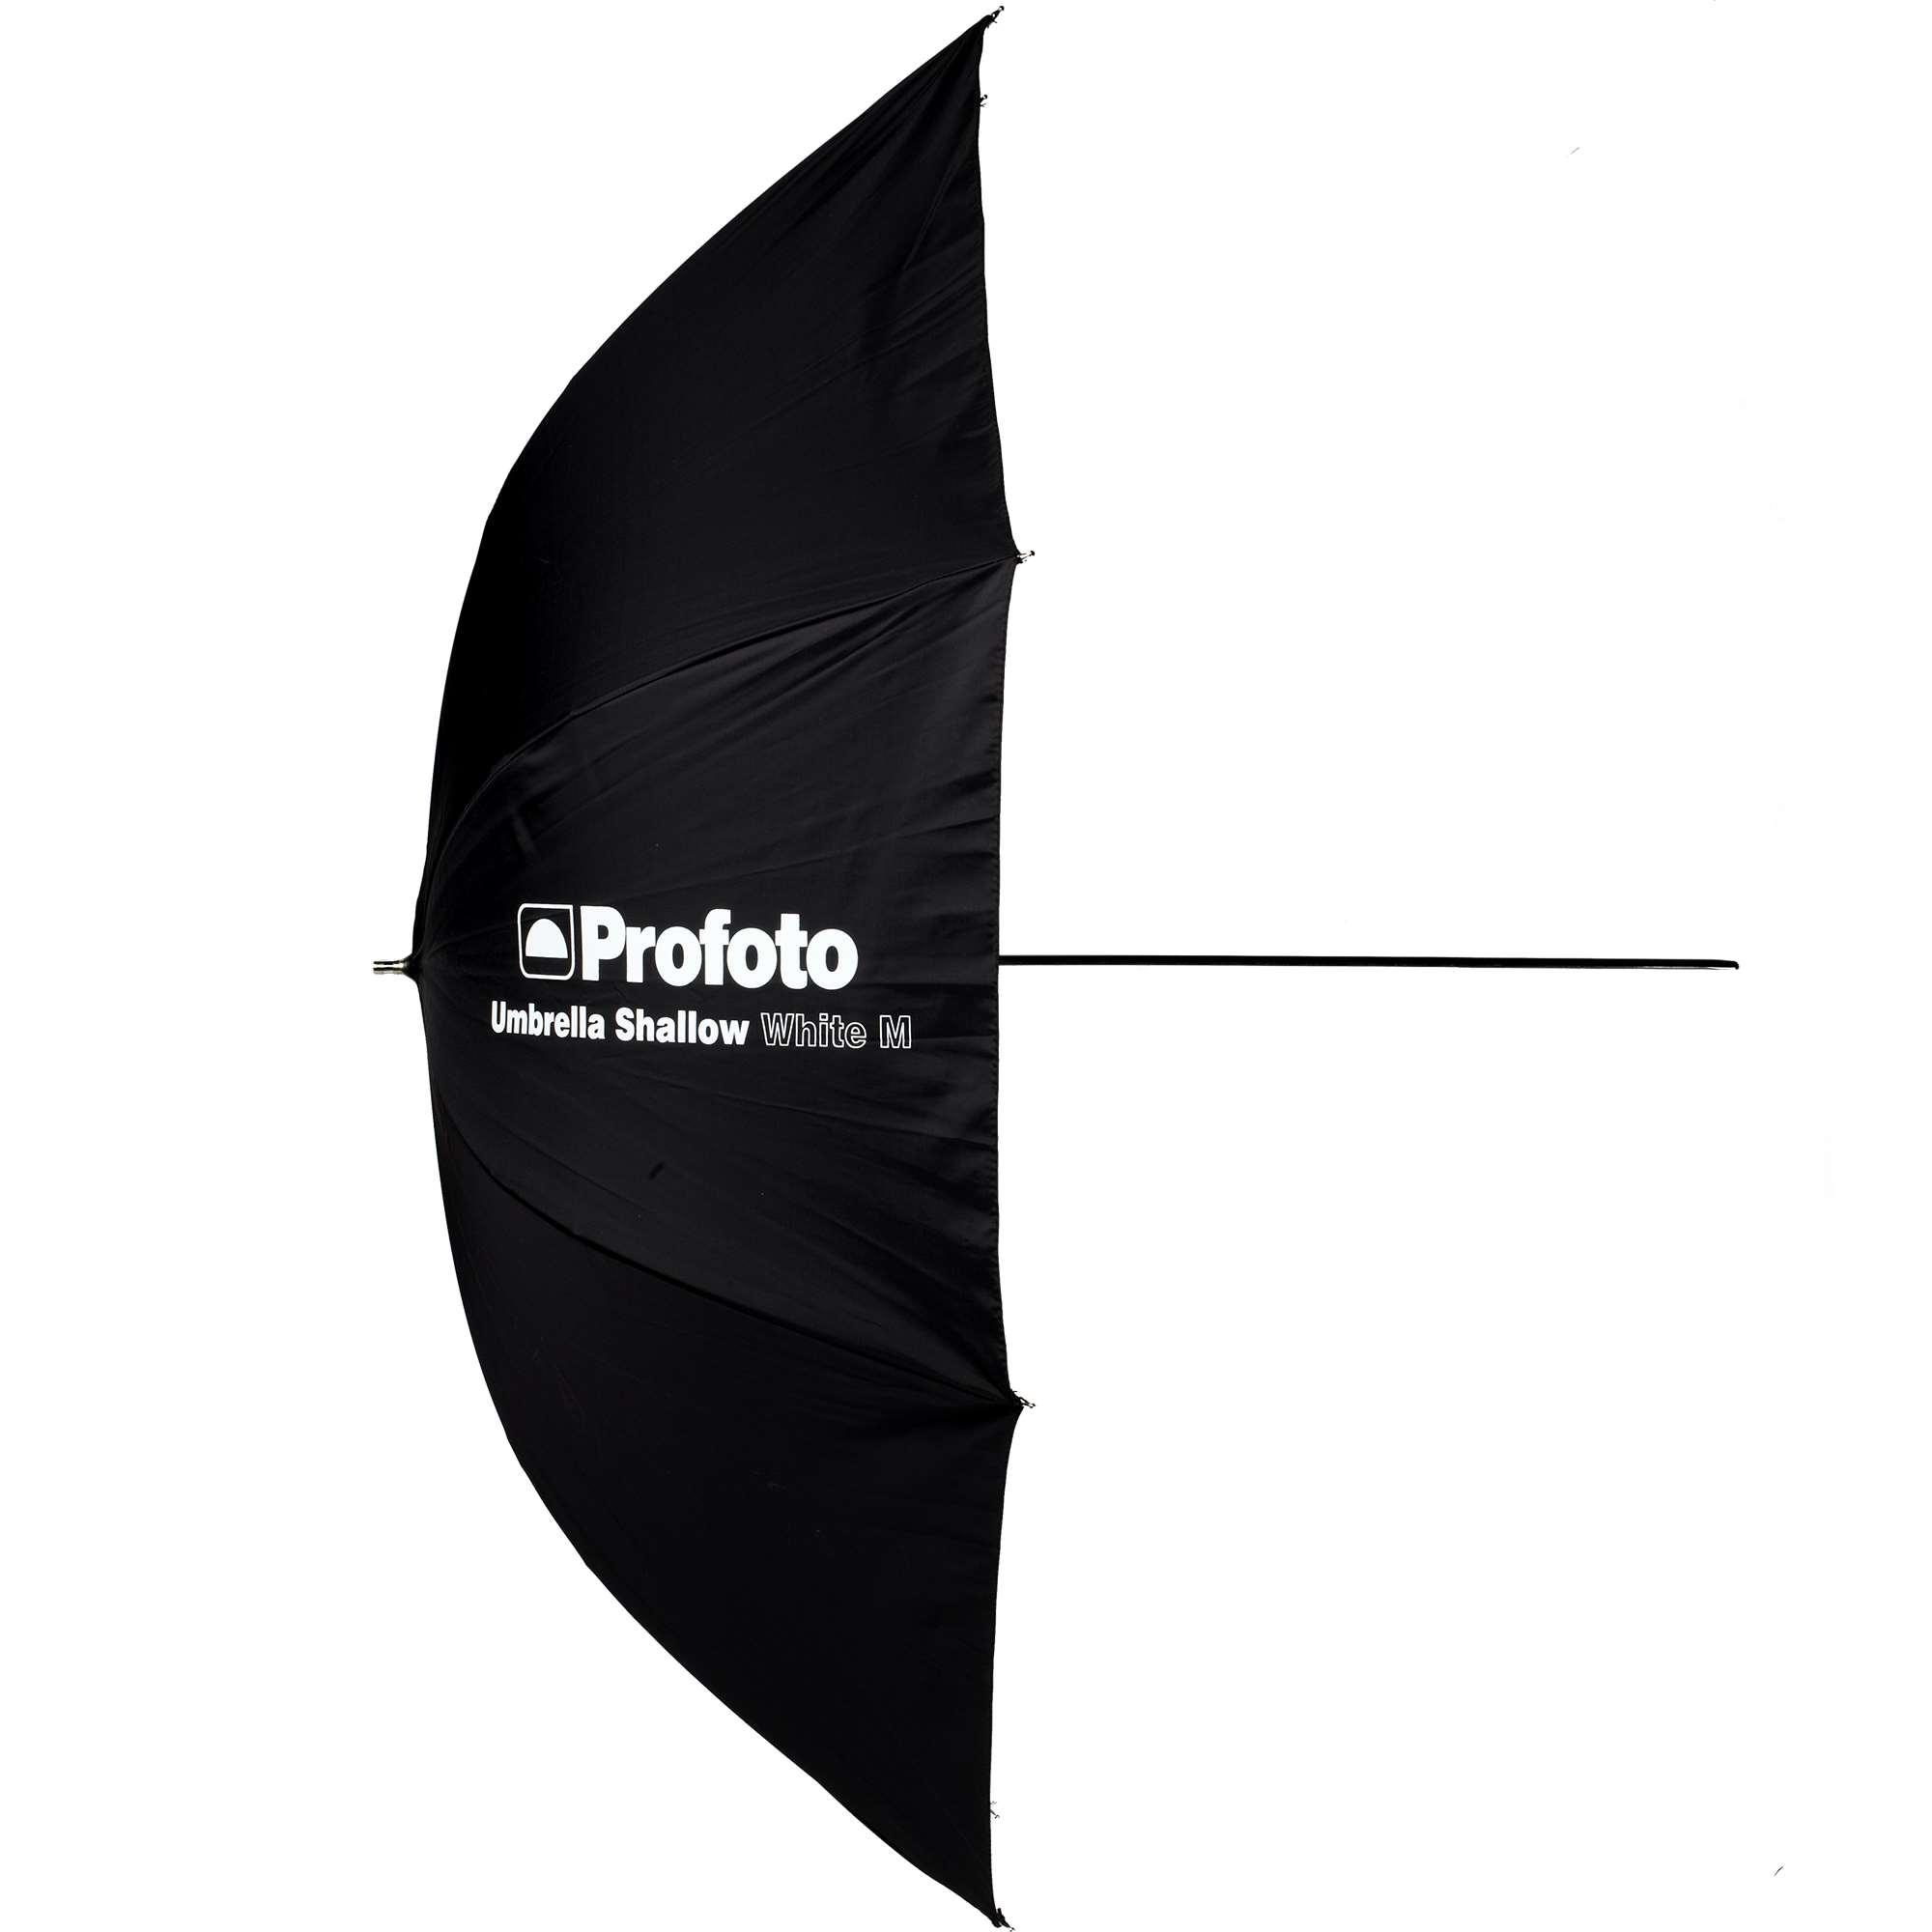 Profoto Umbrella Shallow White M - Profoto paraply hvit strl. M.Dagspris: 50,- eks. mva.